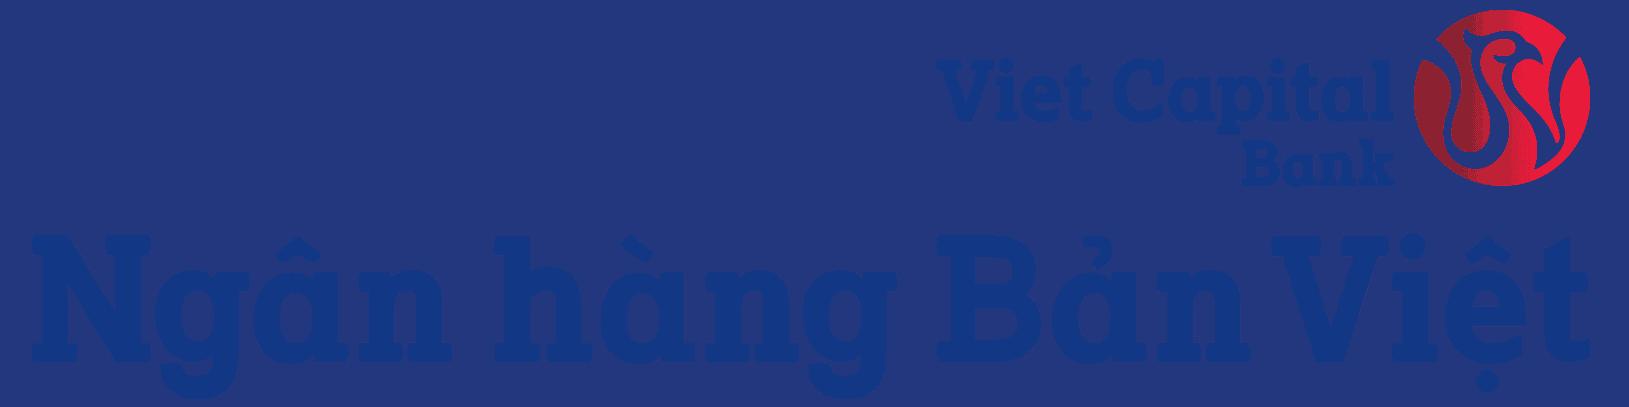 Viet Capital Bank logo